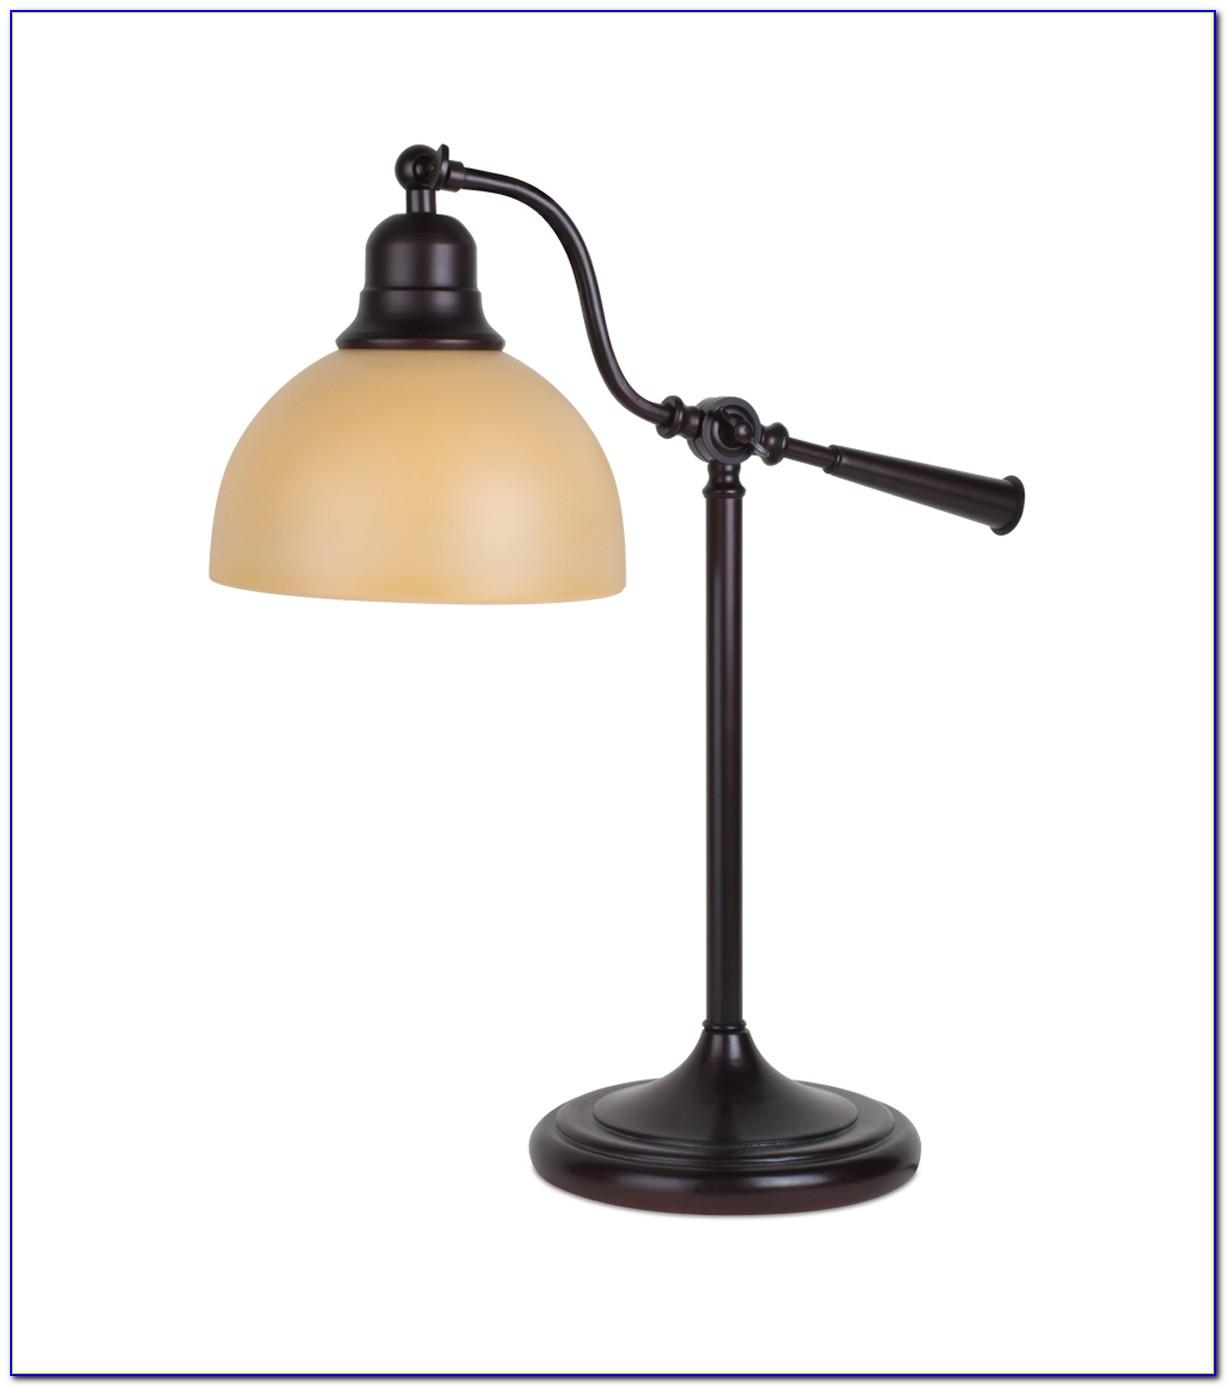 Ottlite Desk Lamp Amazon